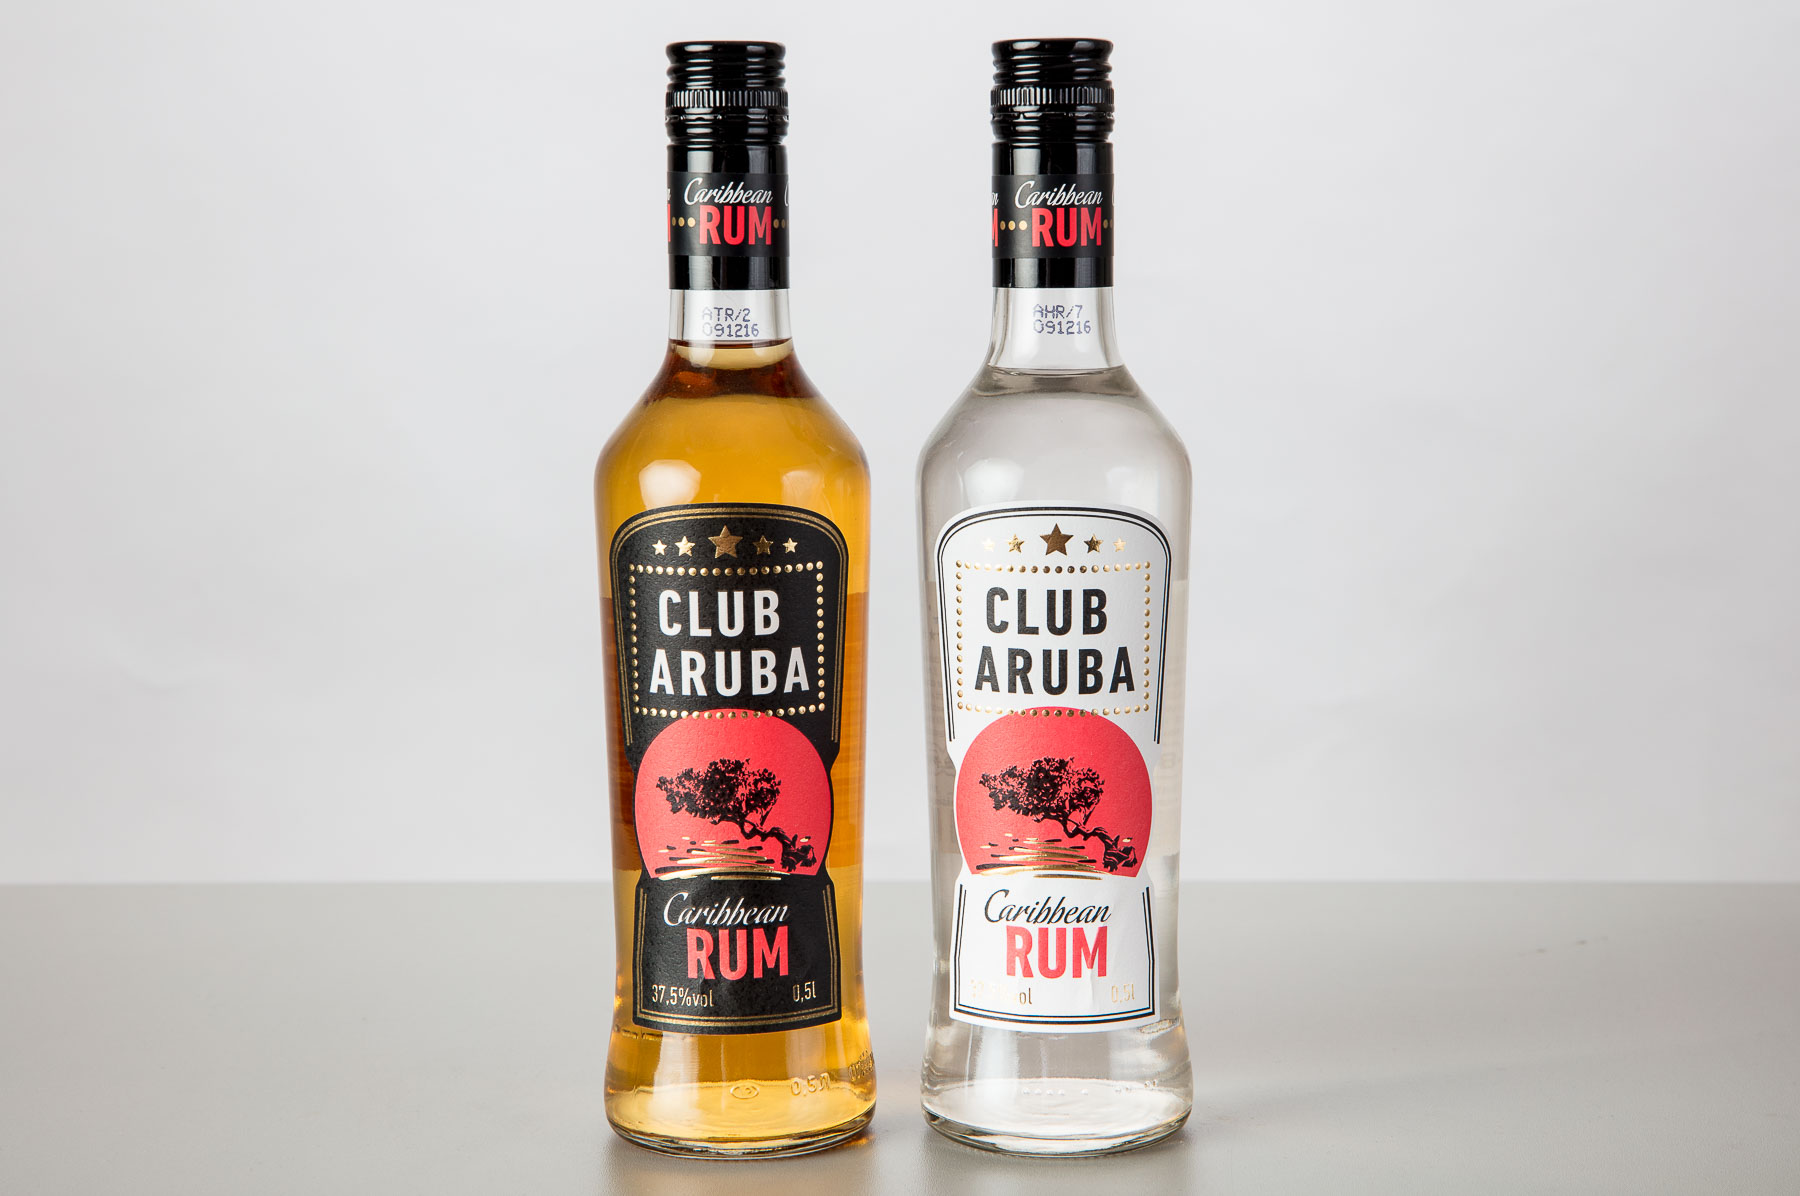 Club Aruba Rum - Apricot OÜ